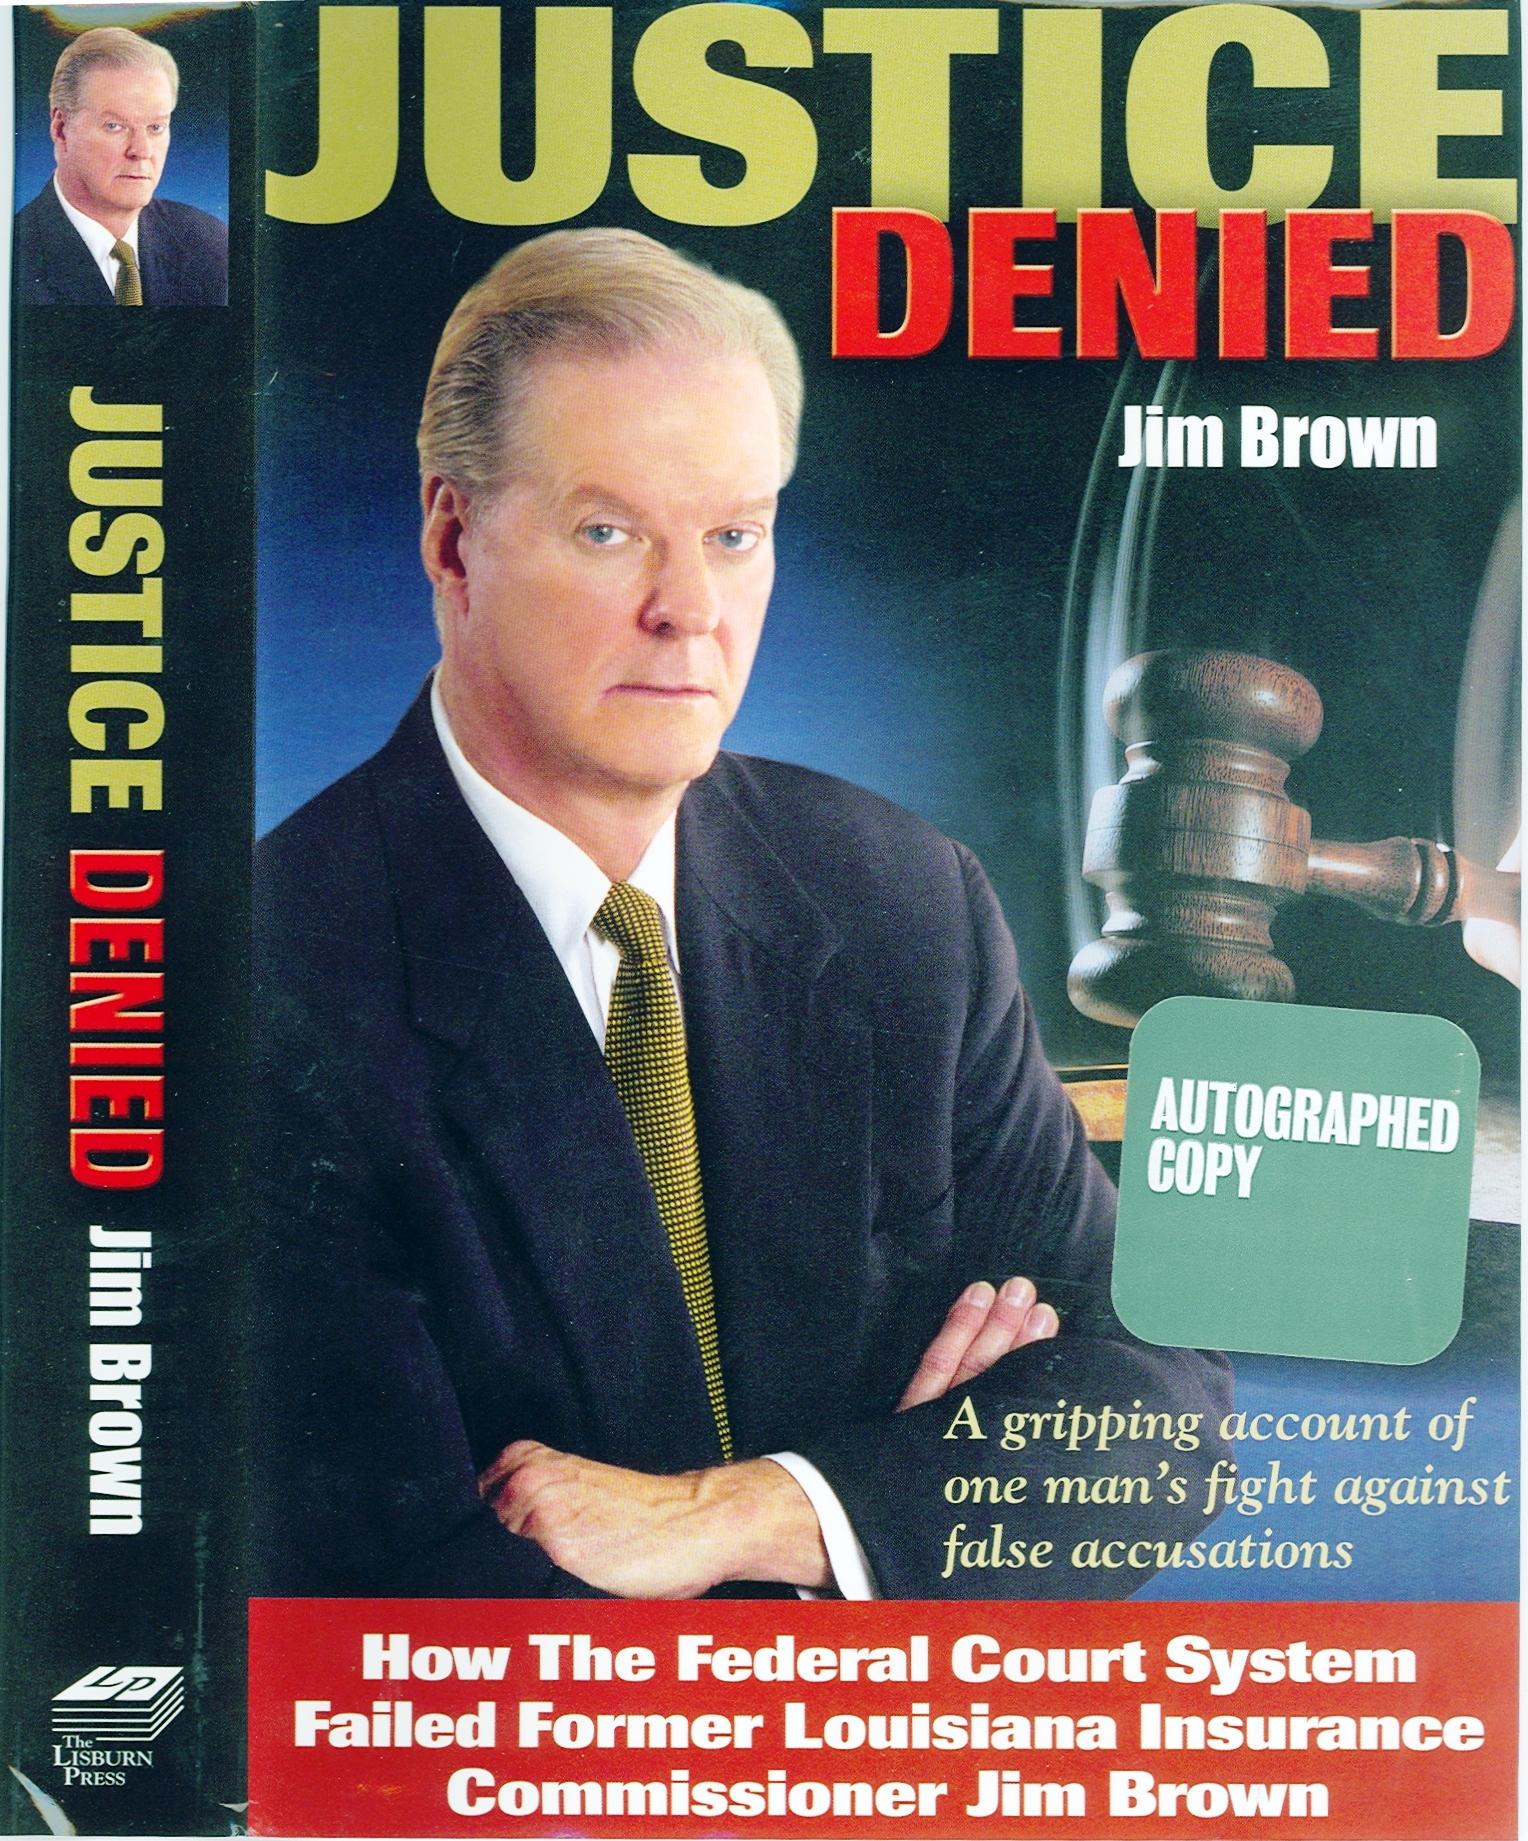 jim-brown-justice-denied